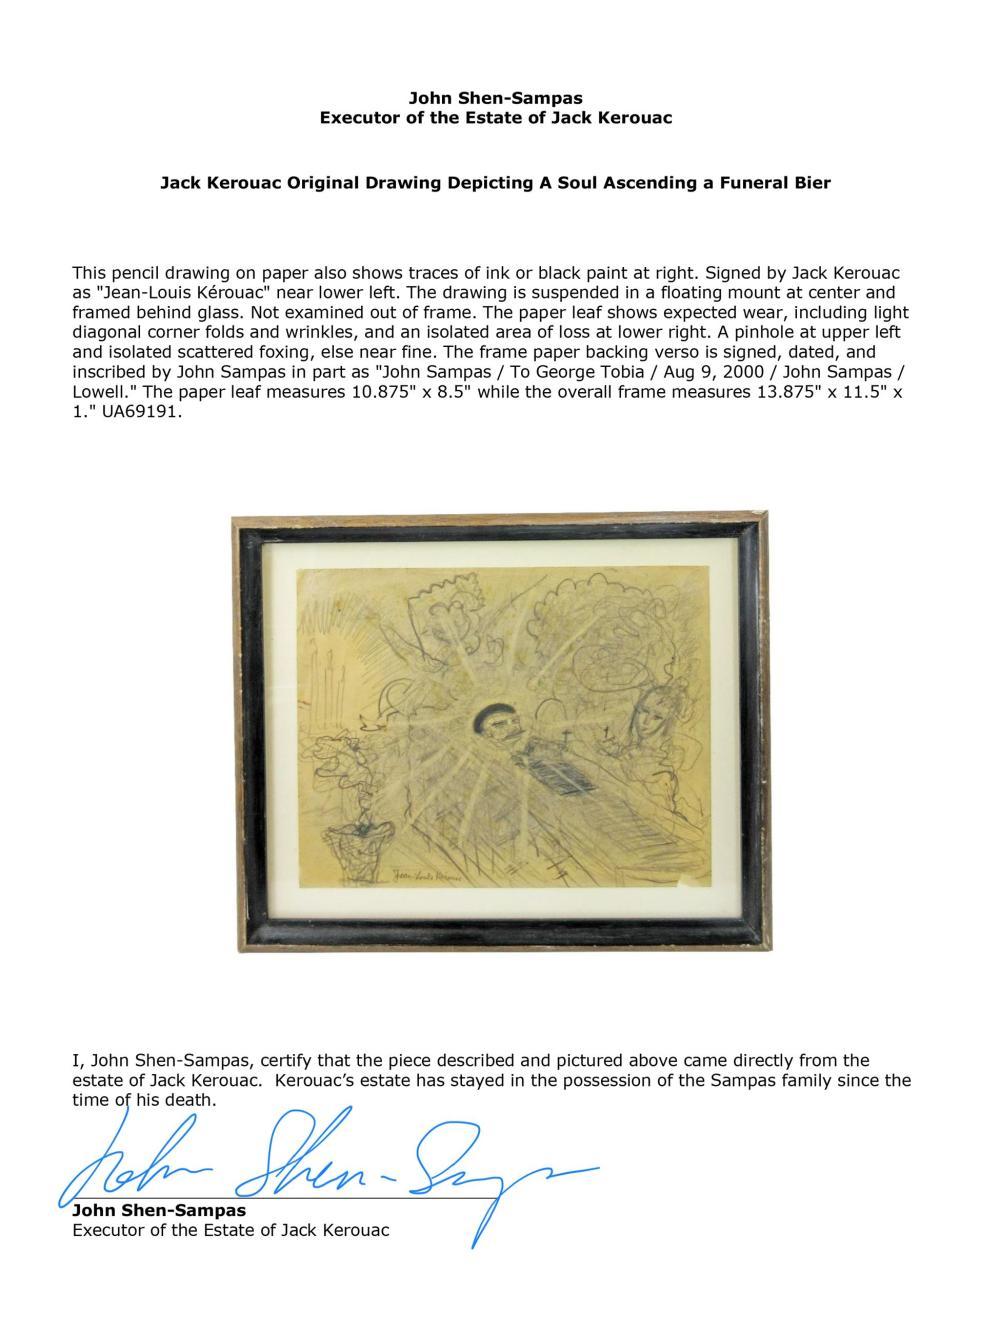 Jack Kerouac Original Drawing Depicting A Soul Ascending a Funeral Bier